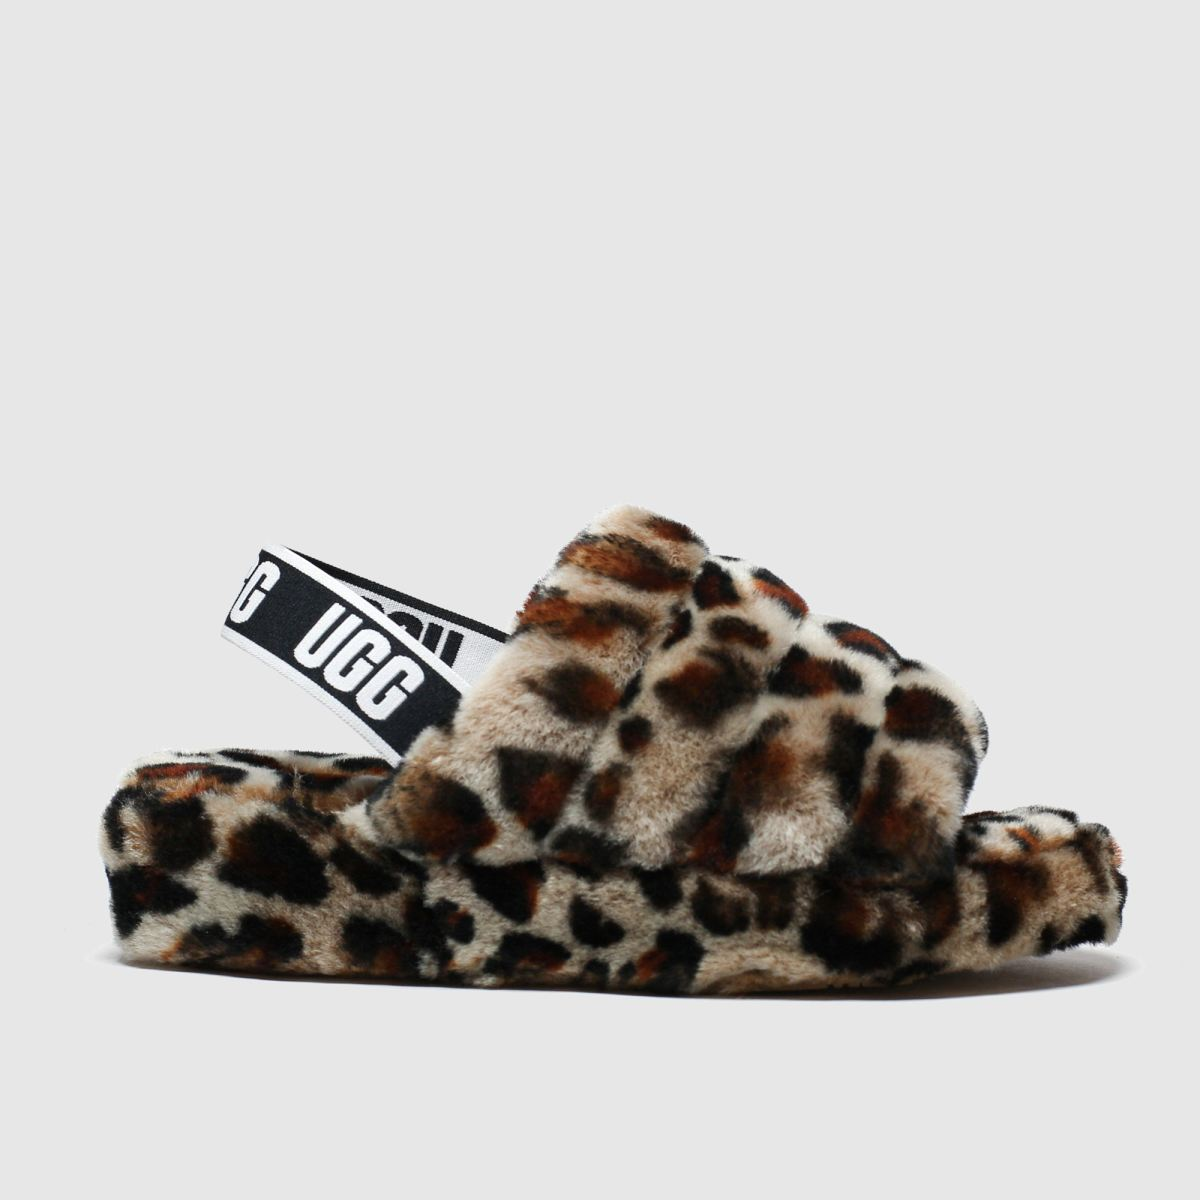 Ugg Brown & Black Fluff Yeah Slide Slippers